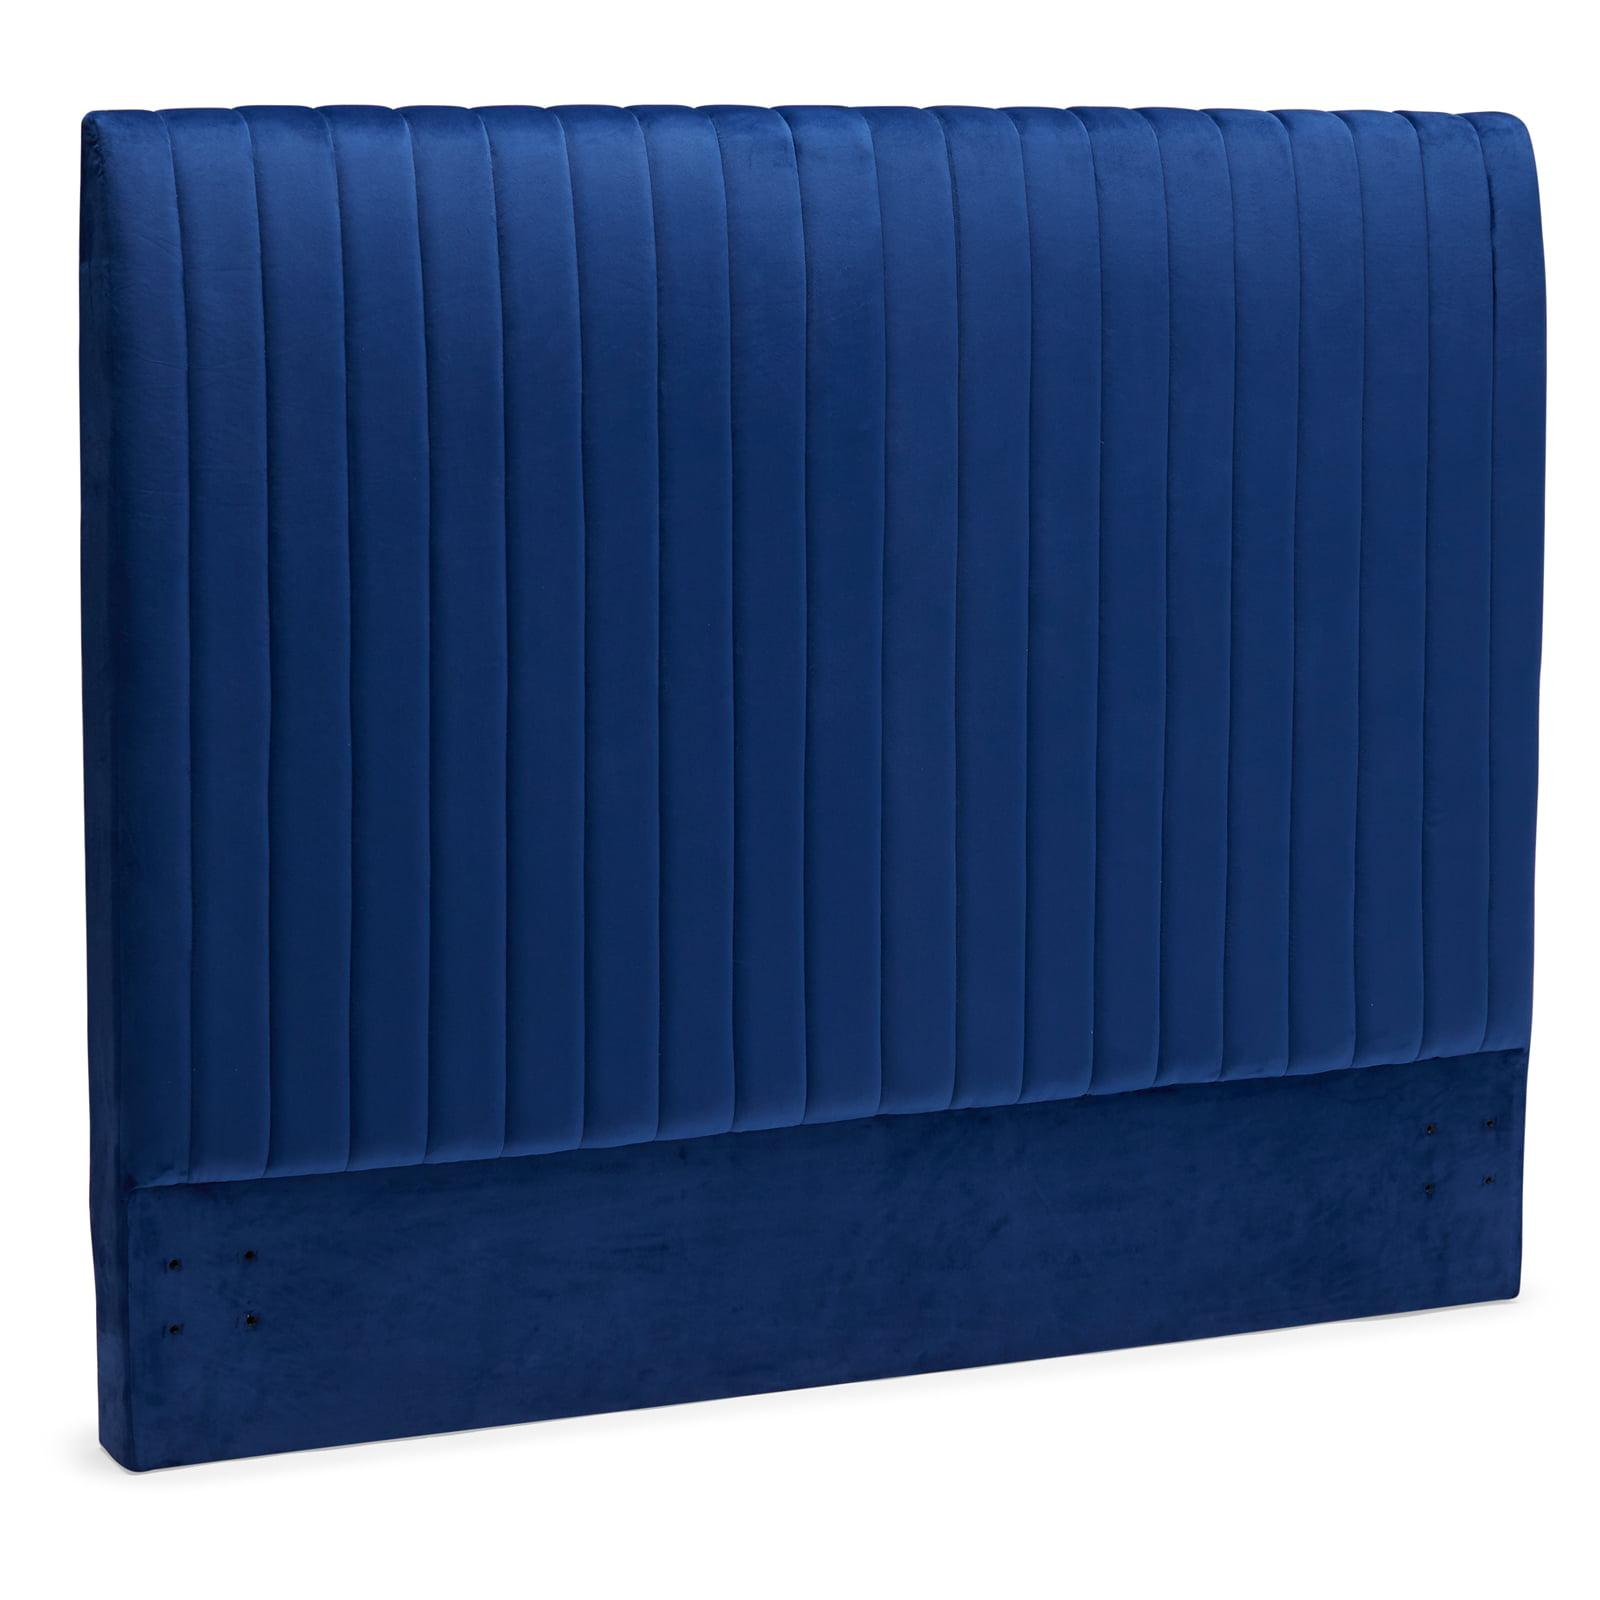 Modrn Marni Channel Tufted Headboard Full Queen Dark Blue Walmart Com Walmart Com